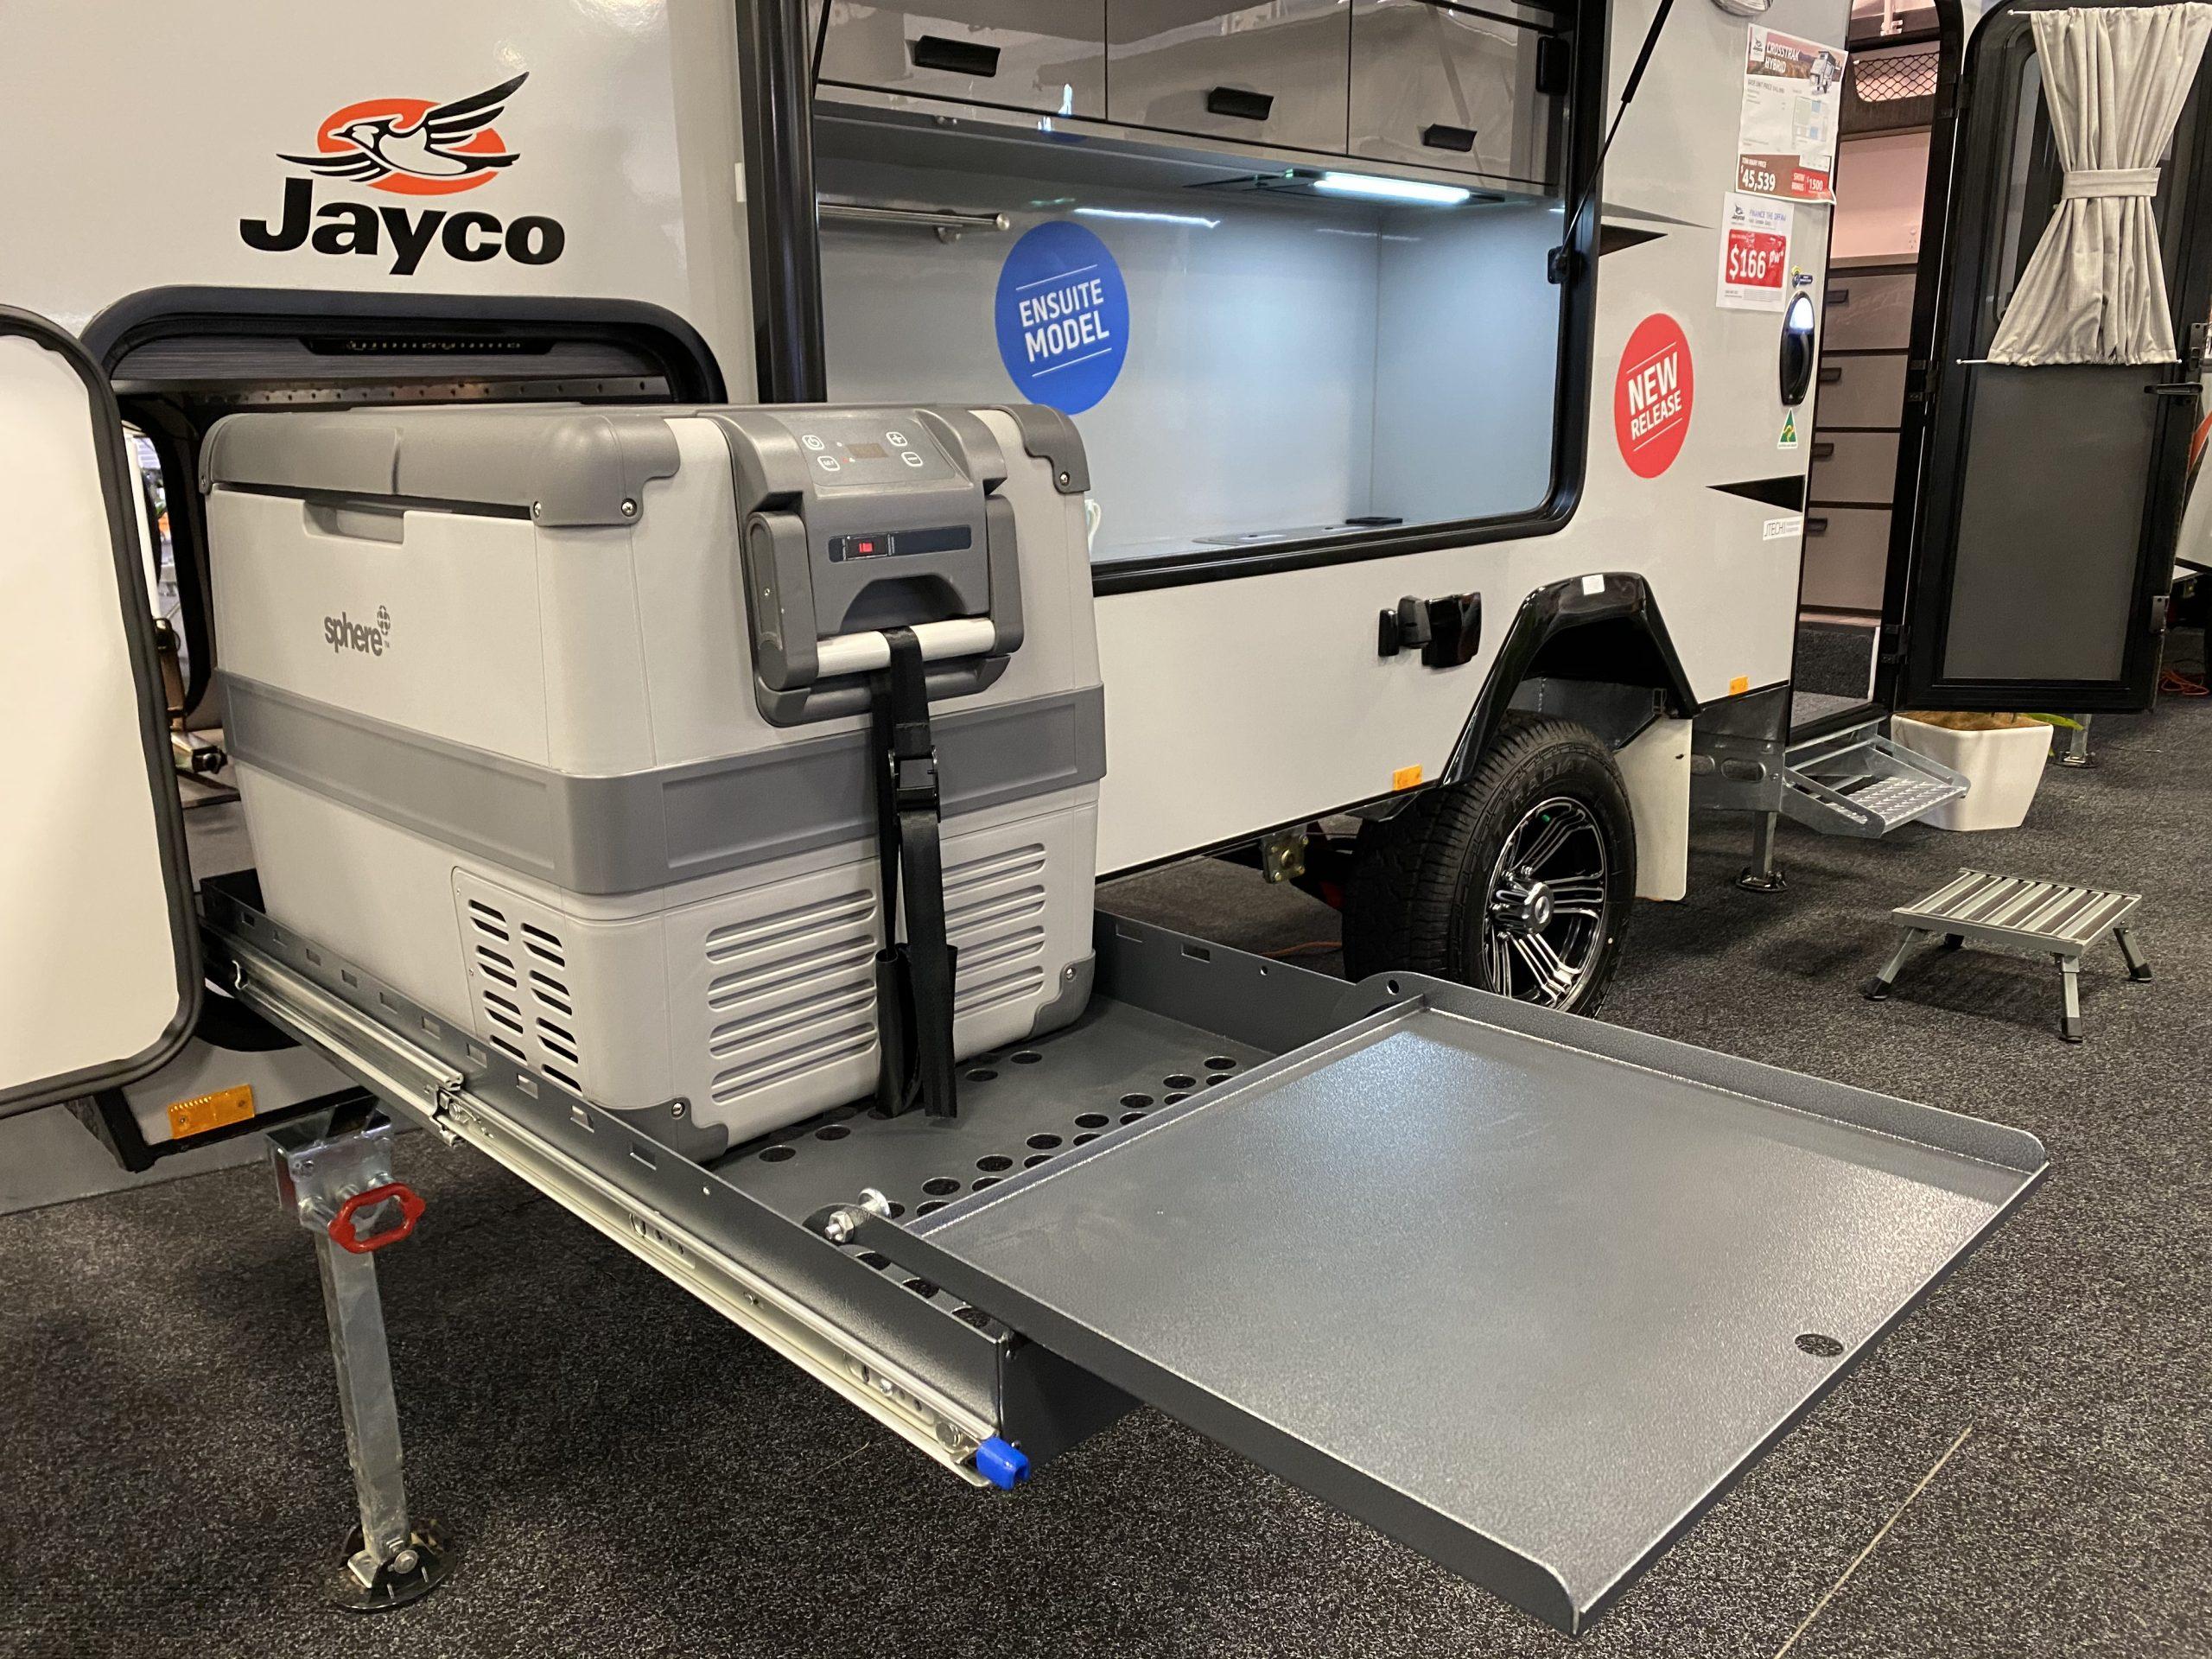 Jayco reveals 16-ft CrossTrak Hybrid with ensuite